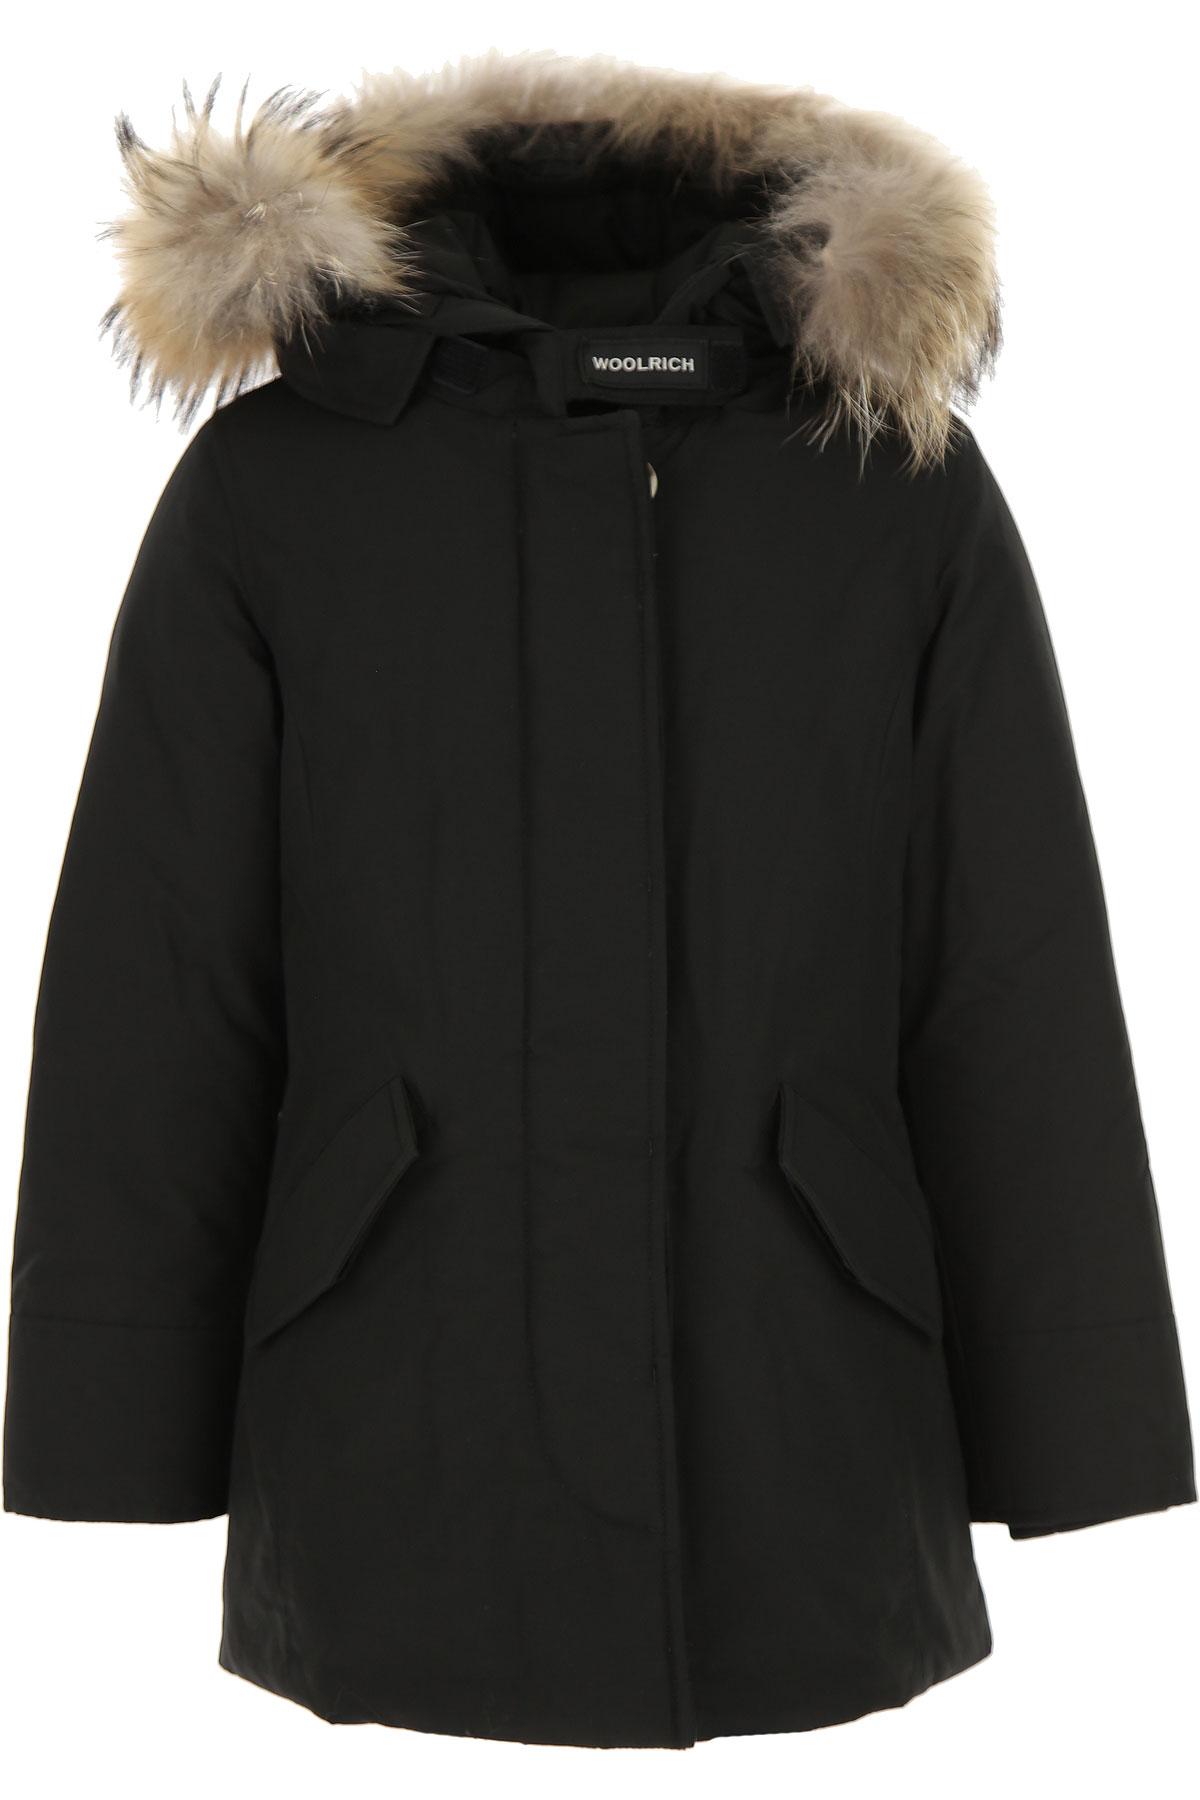 Woolrich {DESIGNER} Kids Coat for Boys On Sale, Black, Cotton, 2019, 12Y 4Y 8Y